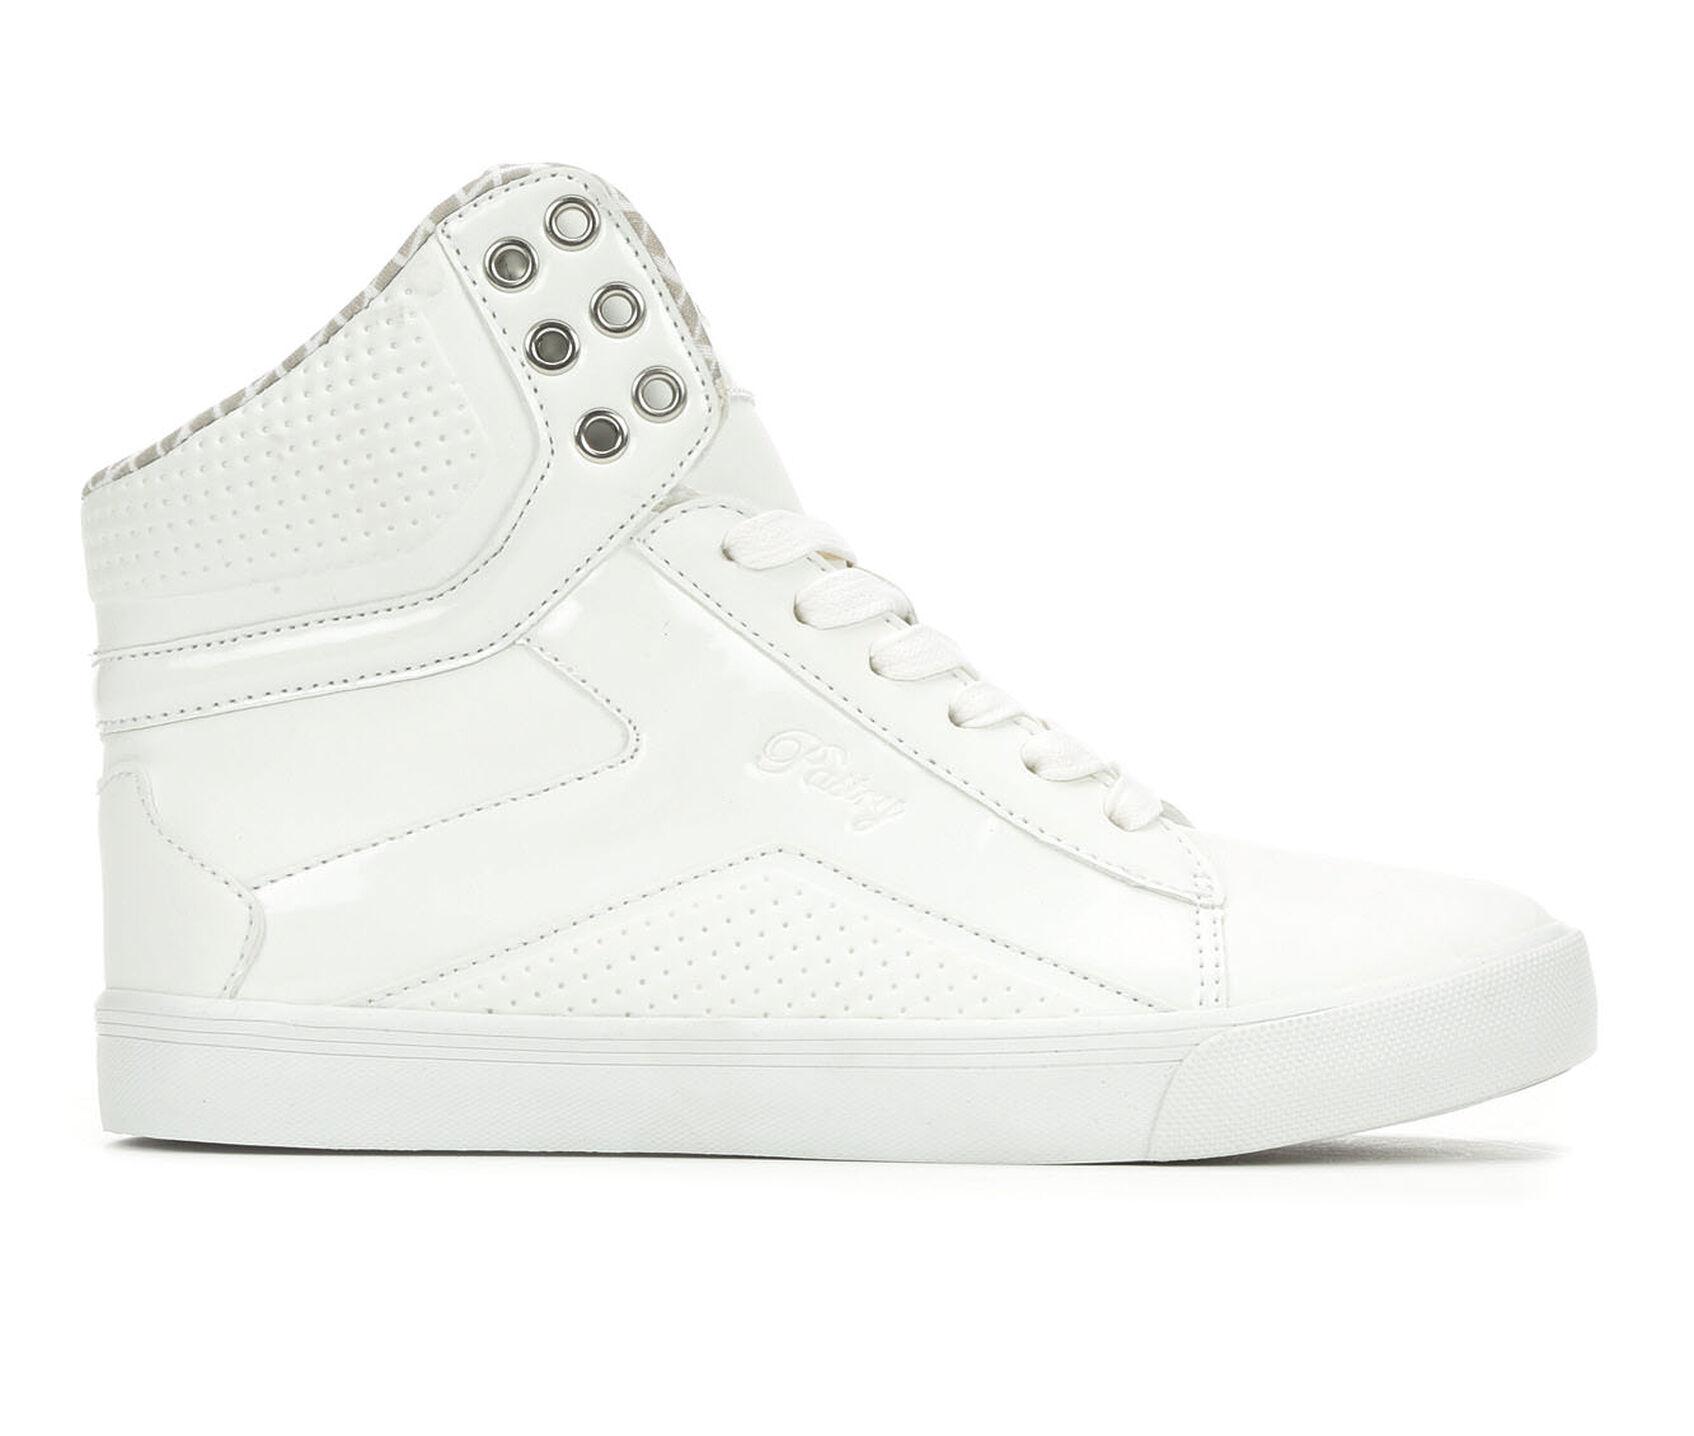 a3b340d1e Women's Pastry Pop Tart Grid High Top Sneakers | Shoe Carnival